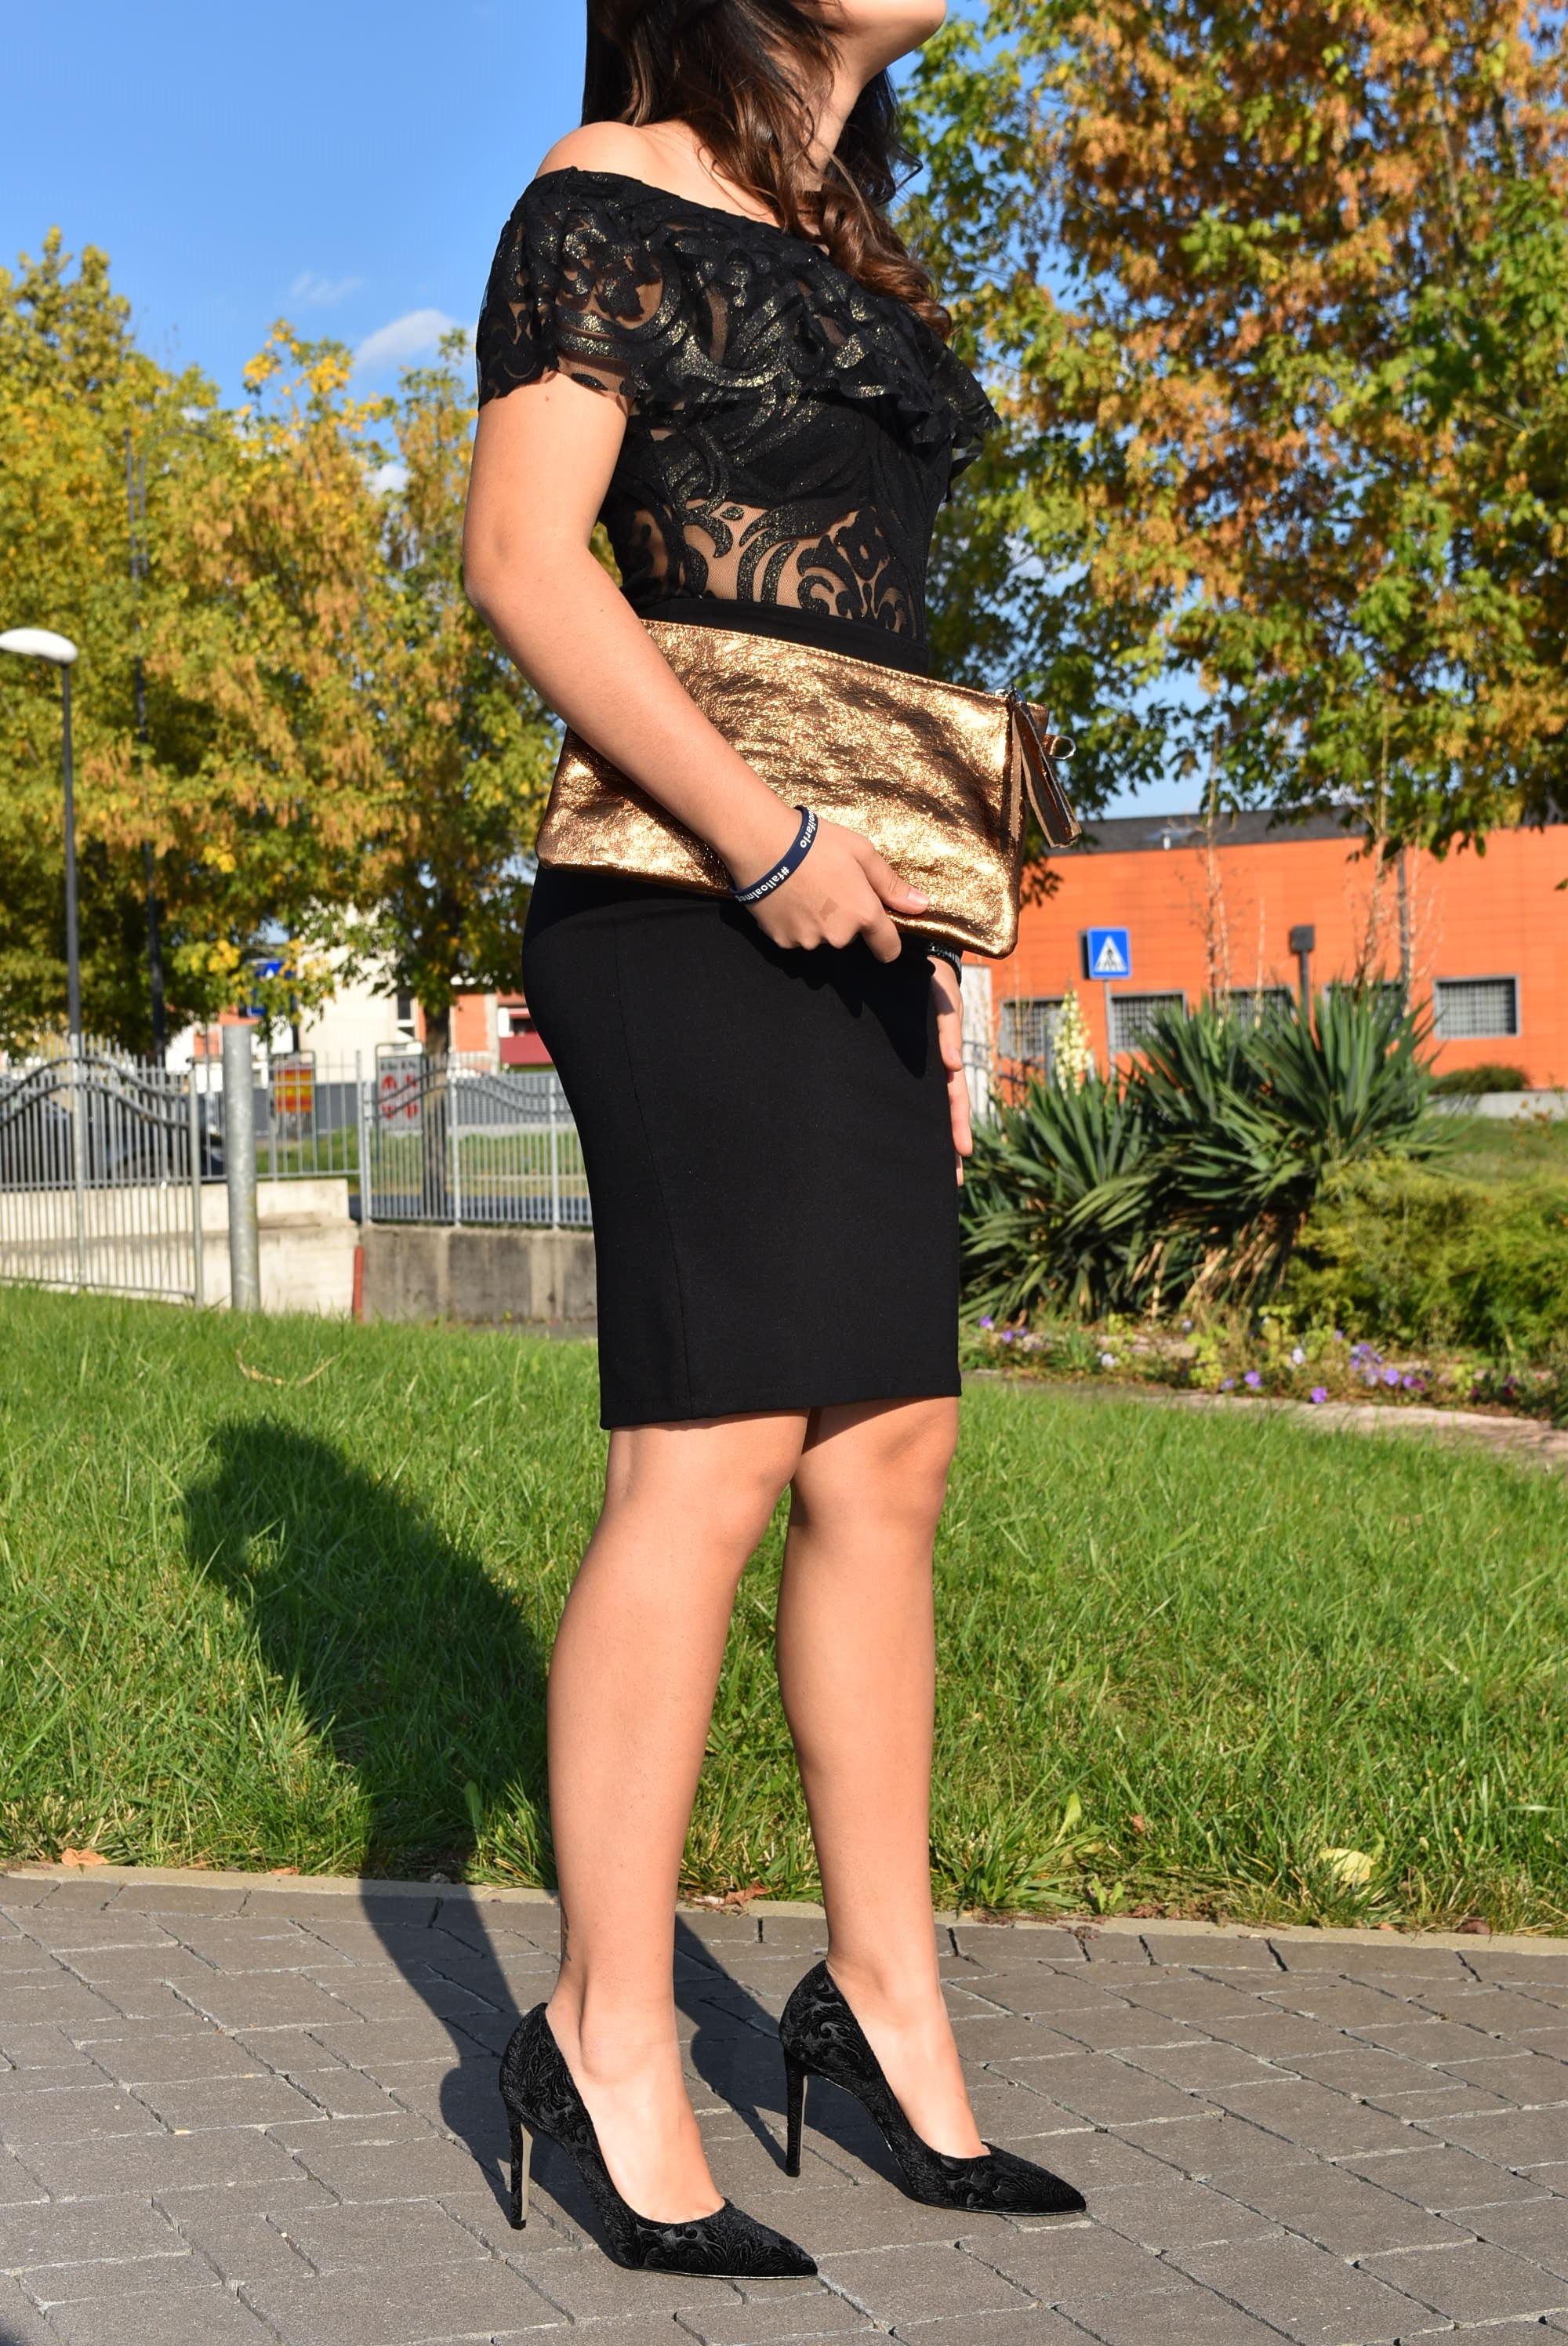 divine-follie-63-270r-270-shoes-my-friends-zamichele-bruno-snc-immagine-homepage